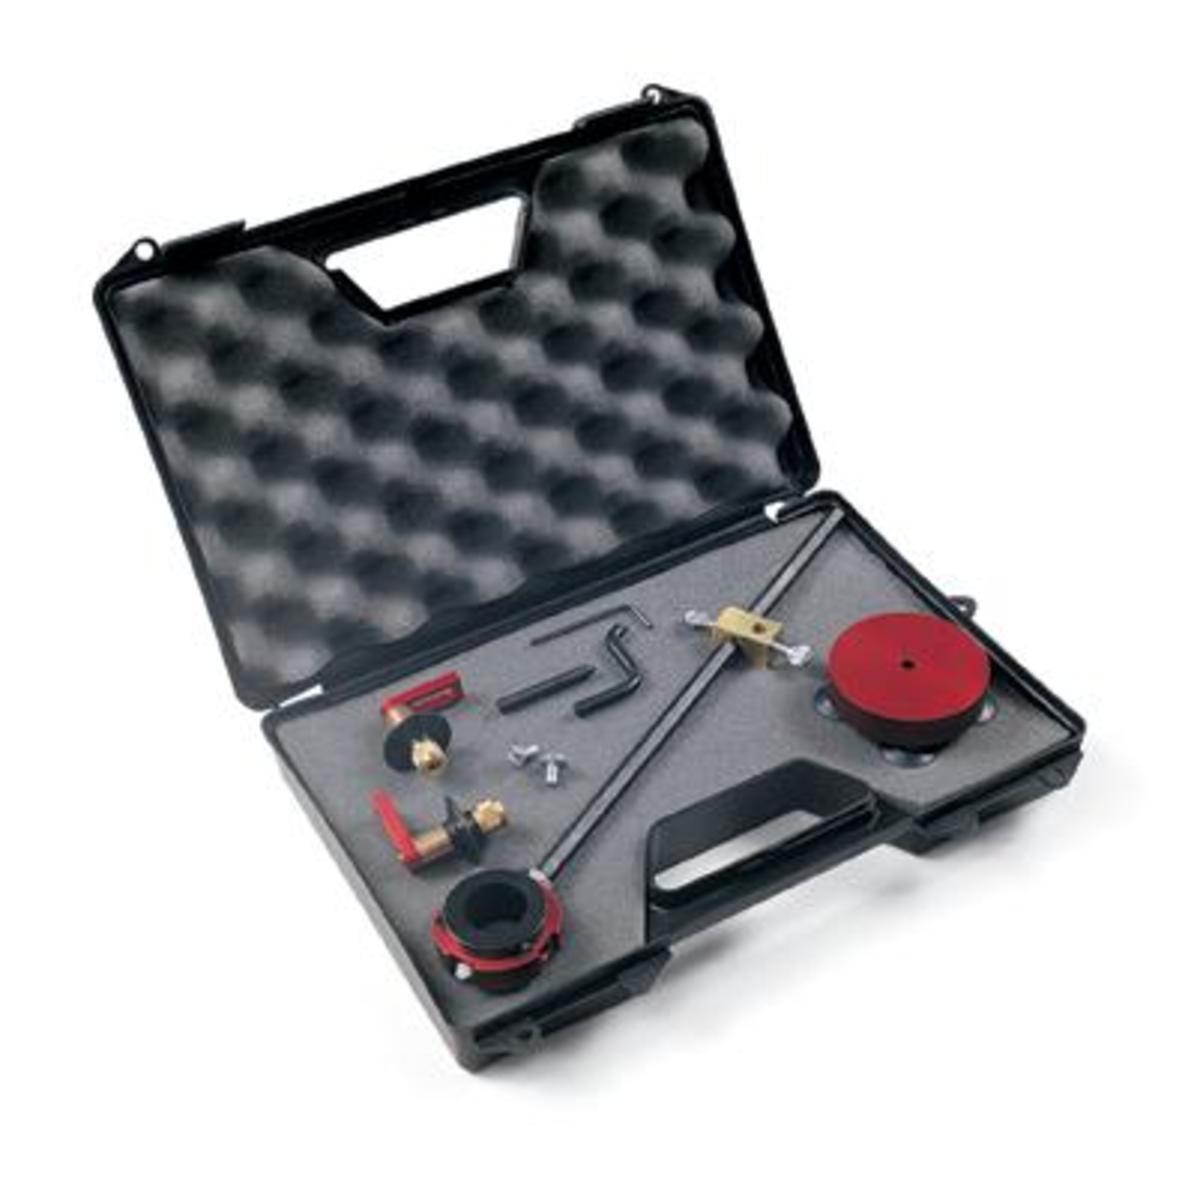 Airgas Hyp027668 Hypertherm Deluxe Circle Cutting Guide  # Plasma De Luxe